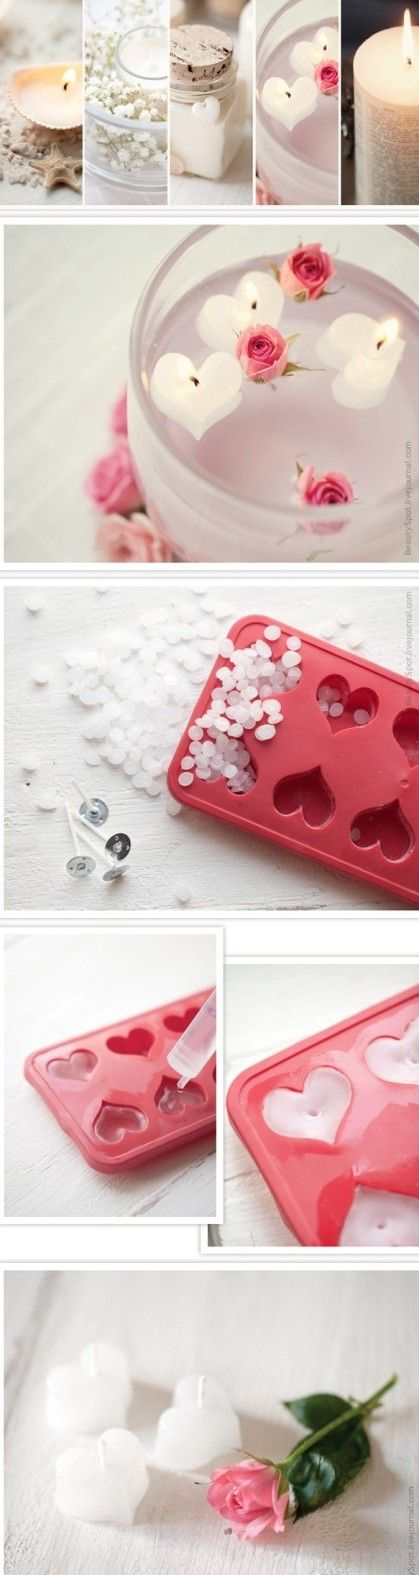 using silicone ice cube trays to make mini tea light candles!